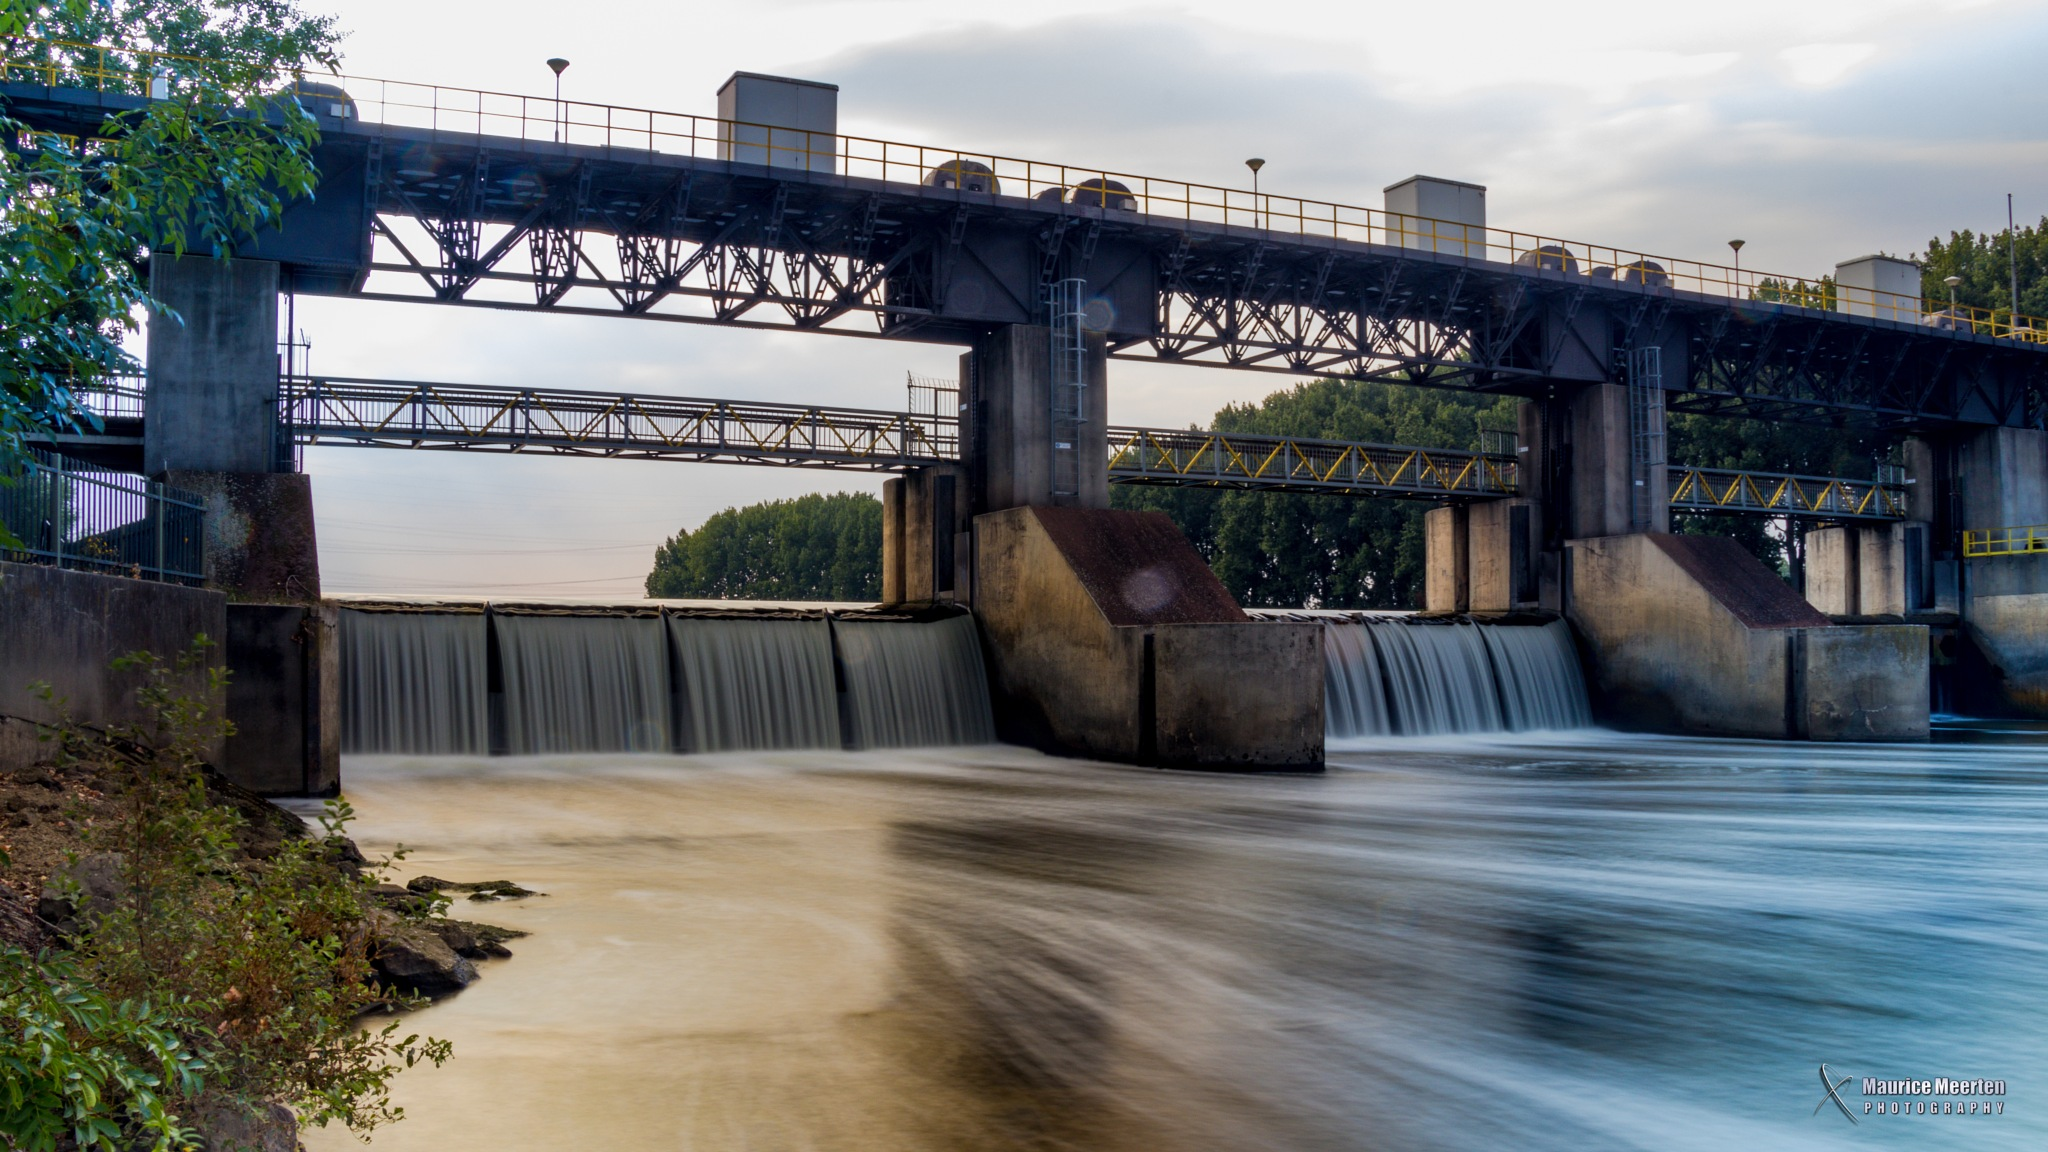 Dam in Linne - The Netherlands / Stuw in Linne by Maurice Meerten